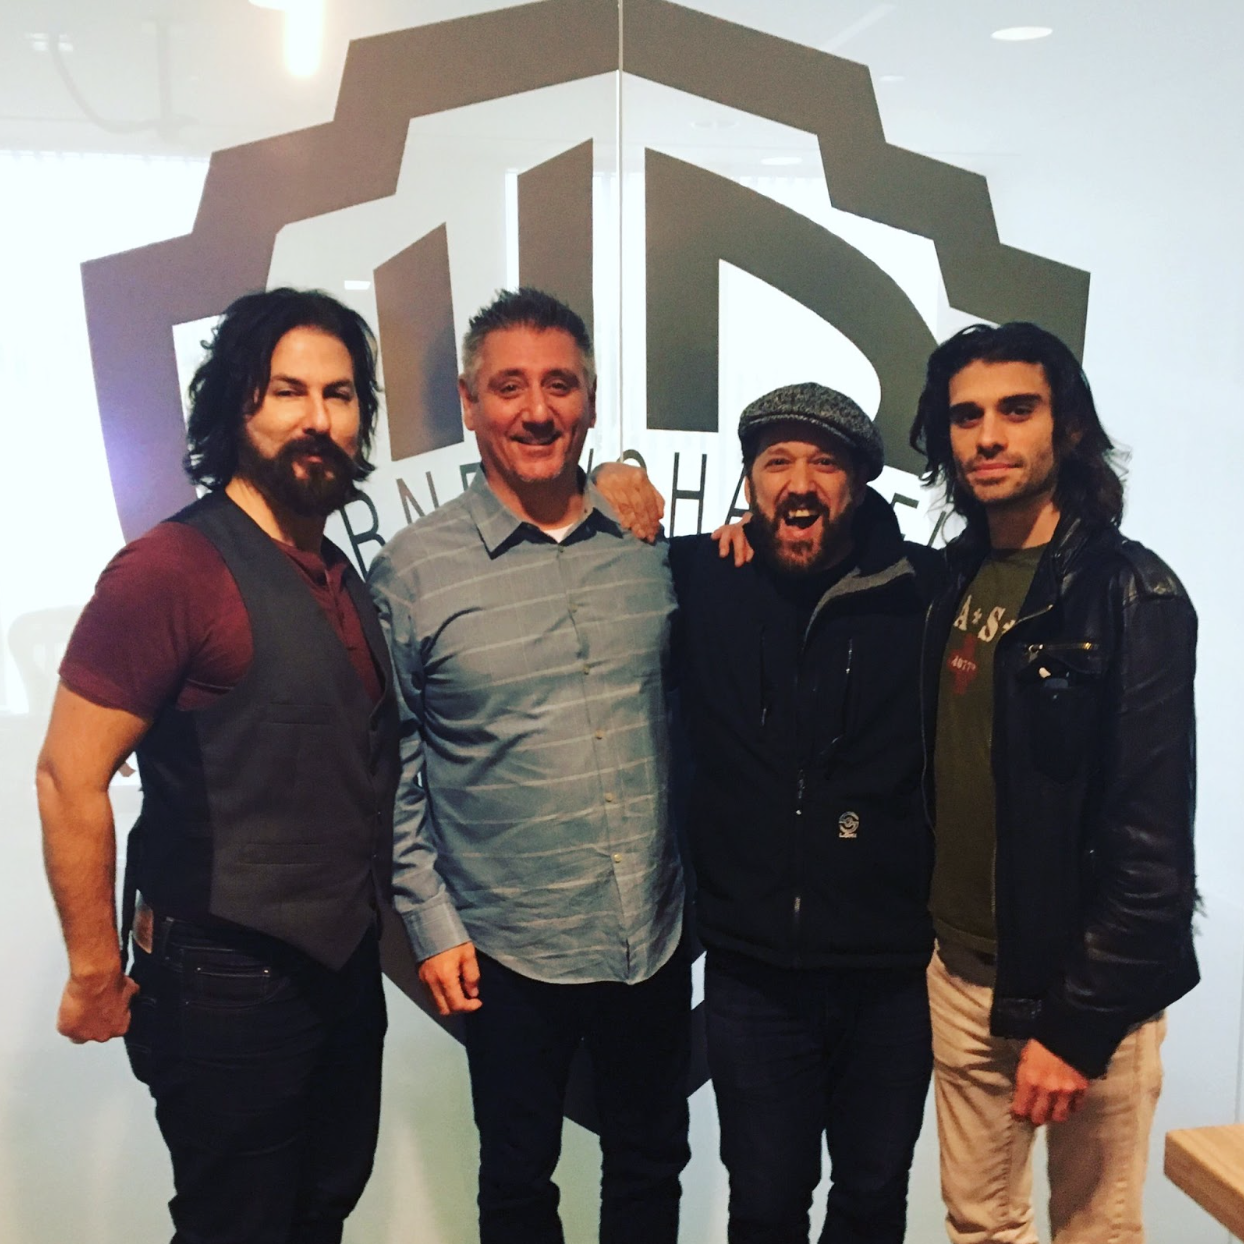 L-R Daniel Scott (SecondsAFTER Music), Dave Georgeff (Warner Chappell/Warner Bros.), Jeff Serra (SecondsAFTER Music), Tony Bernardo (SecondsAFTER Music)